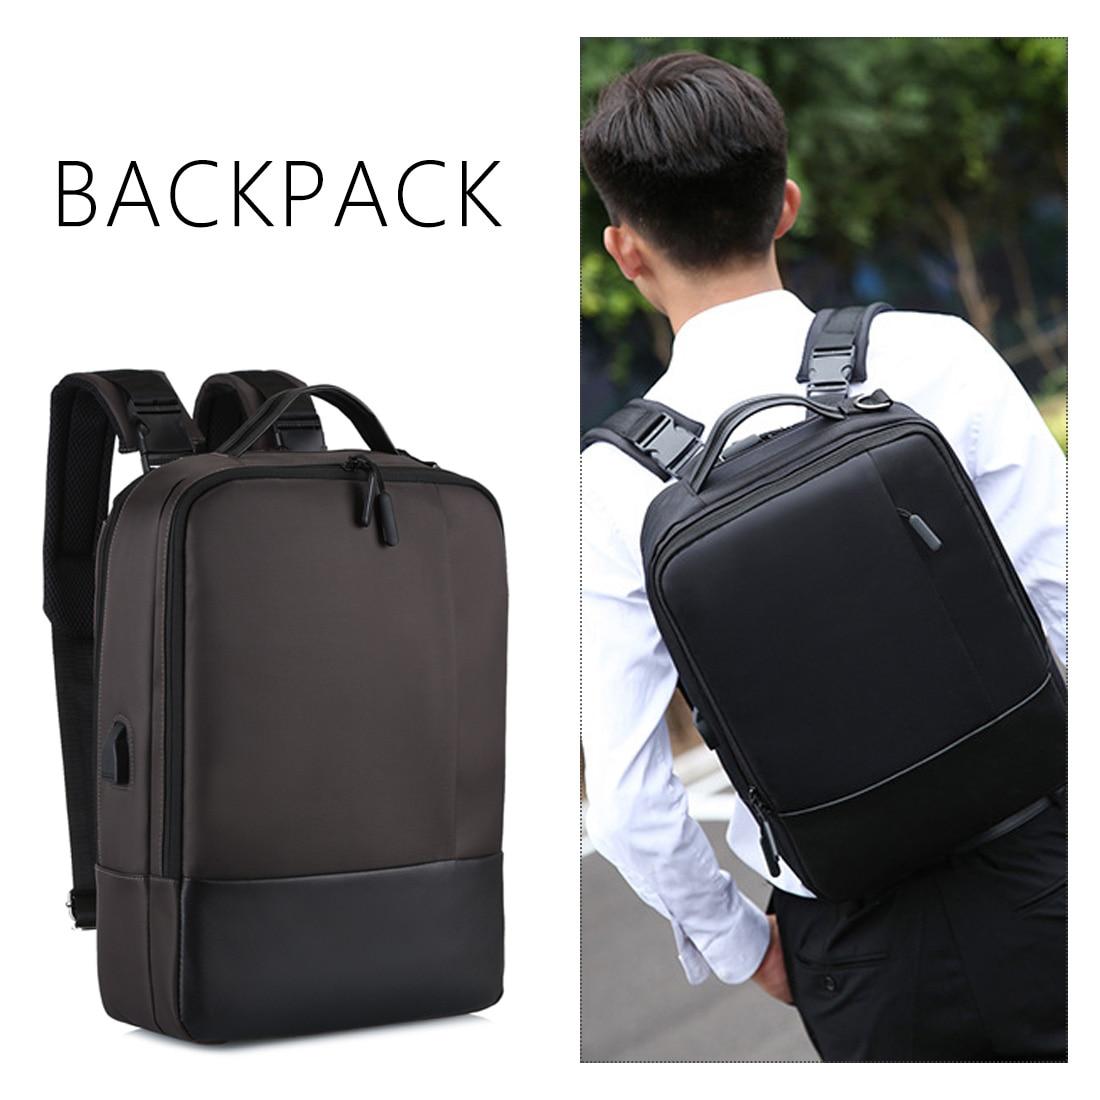 Multi Function WaterproofAnti Theft Laptop Bag Handbag Shoulder BagMen Women Notebook Handbag Backpack 17 Inch